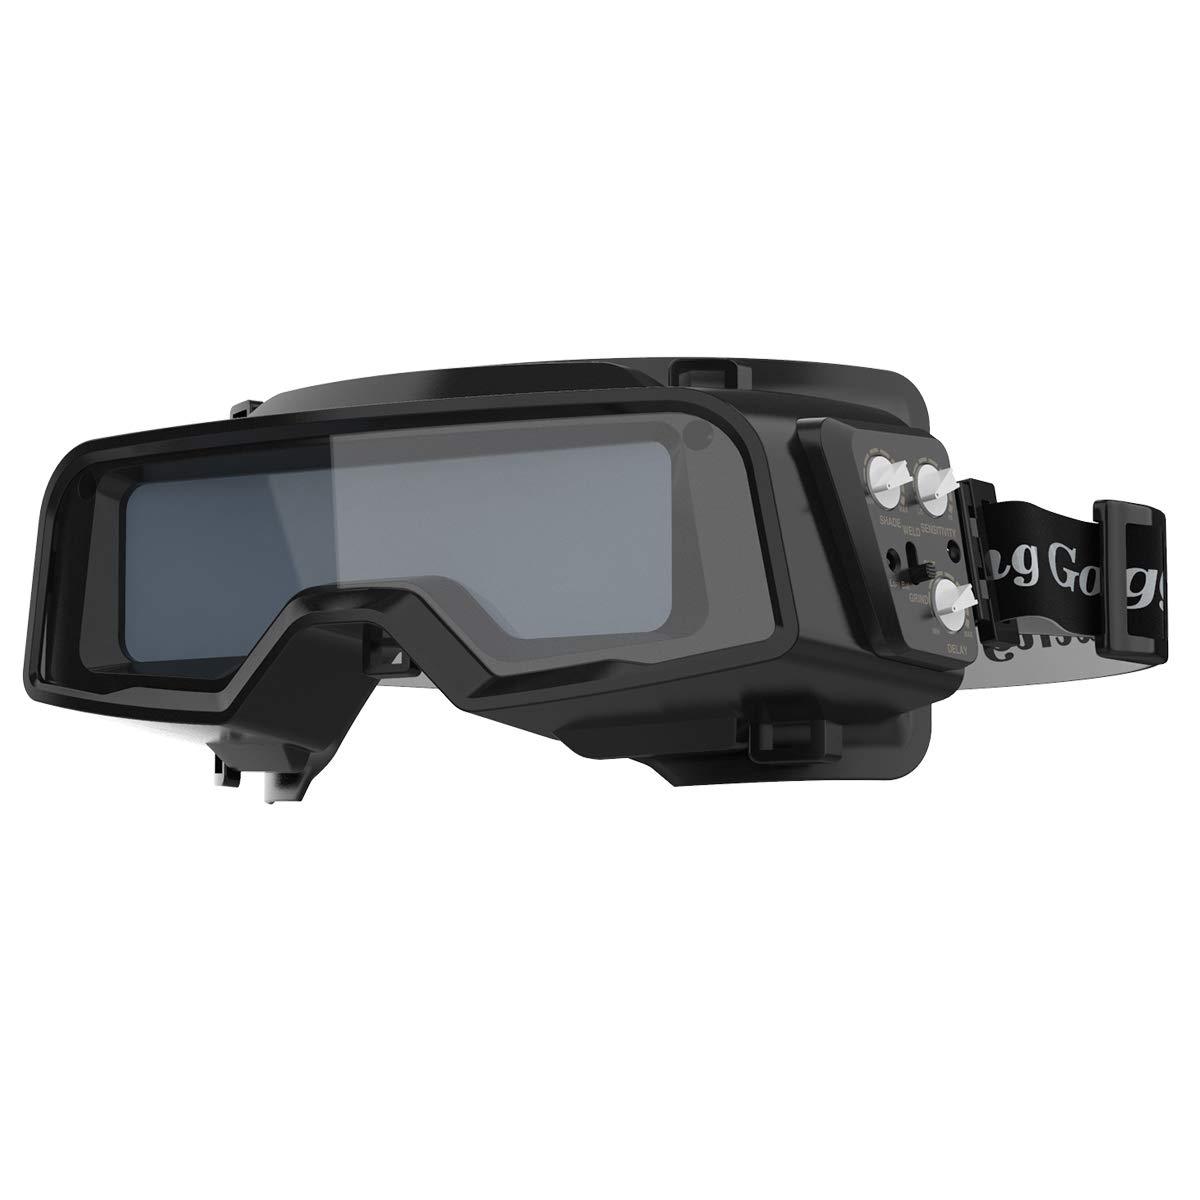 YESWELDER True Color Auto Darkening Welding Goggles,Wide Shade Range 4/5-9/9-13 with Grinding, Welding Glasses Welder Mask for TIG MIG MMA Plasma